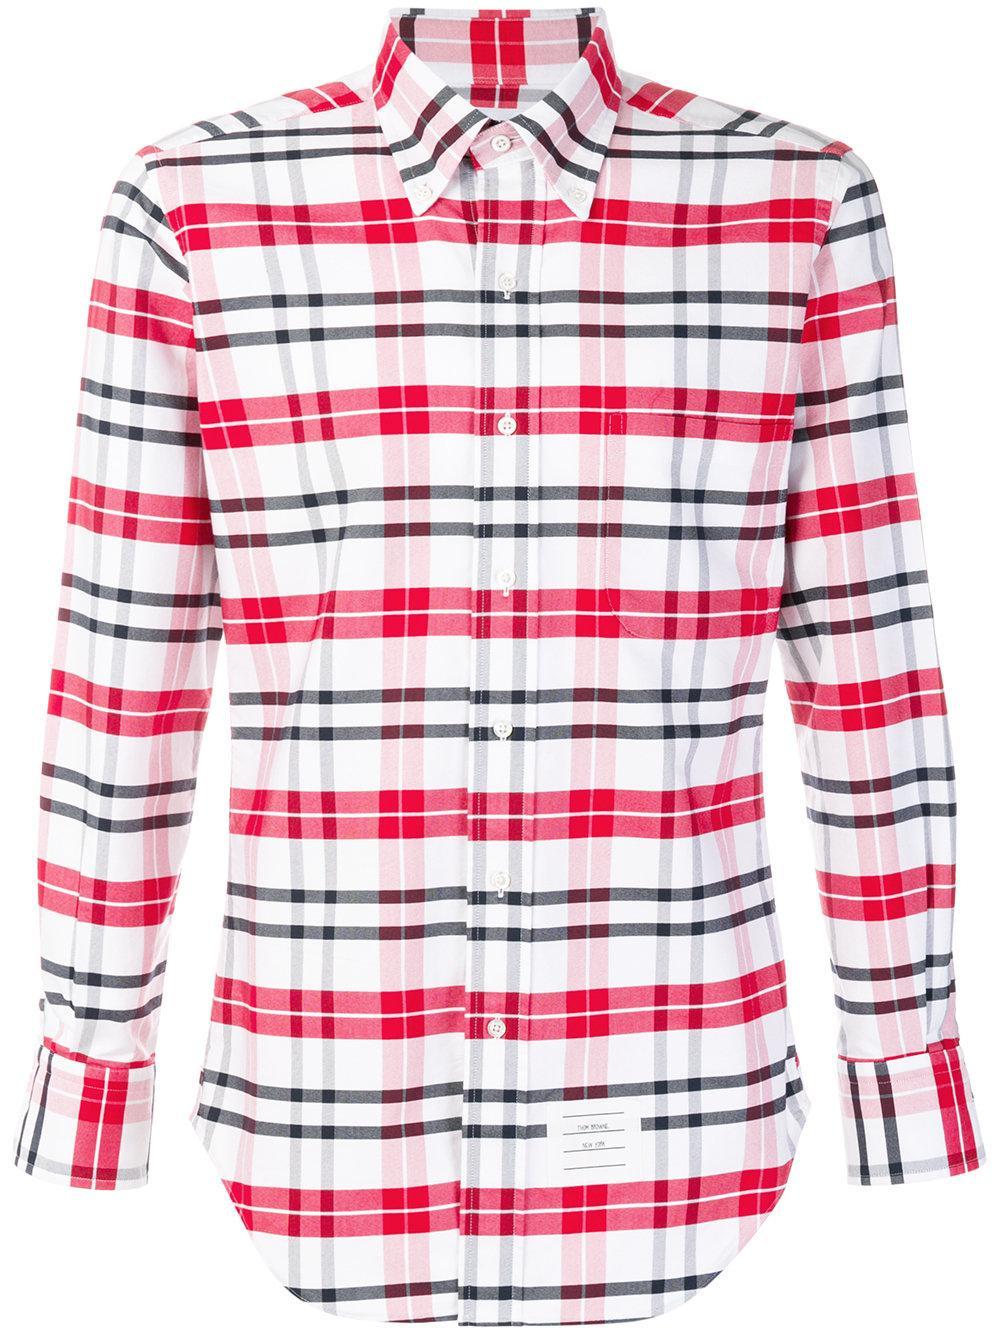 Thom Browne Tartan Shirt In Red